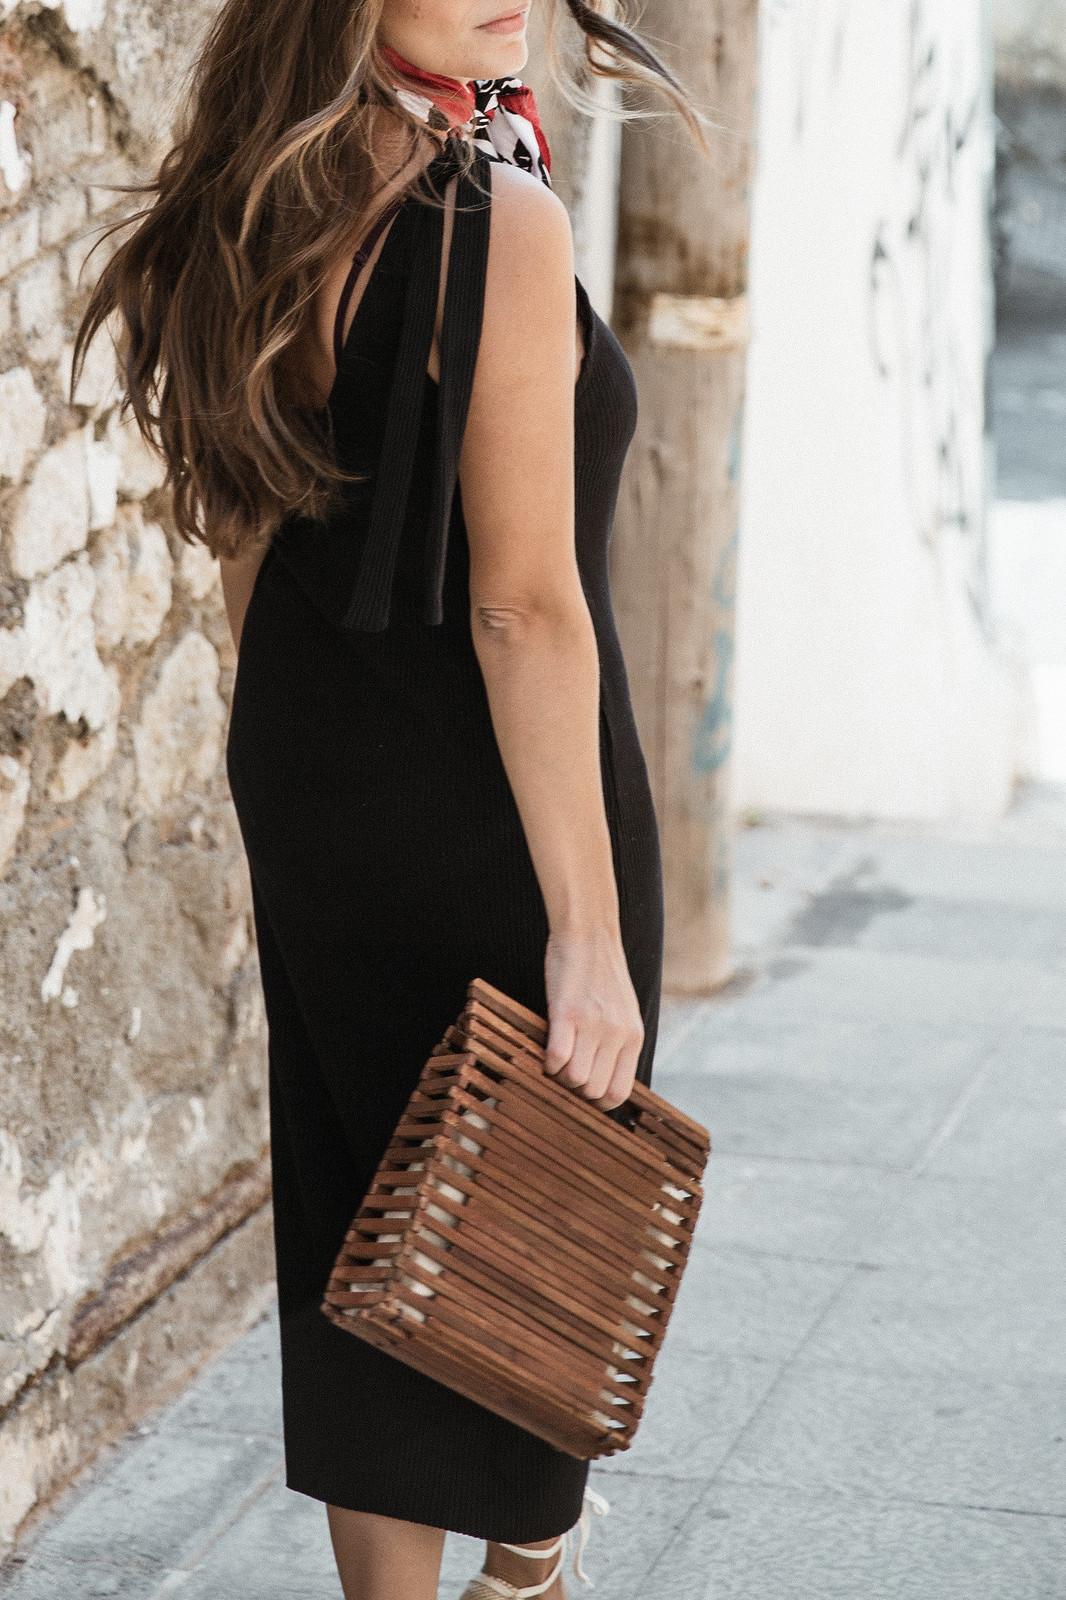 seams for a desire - jessie chanes - black tight dress - zara-2